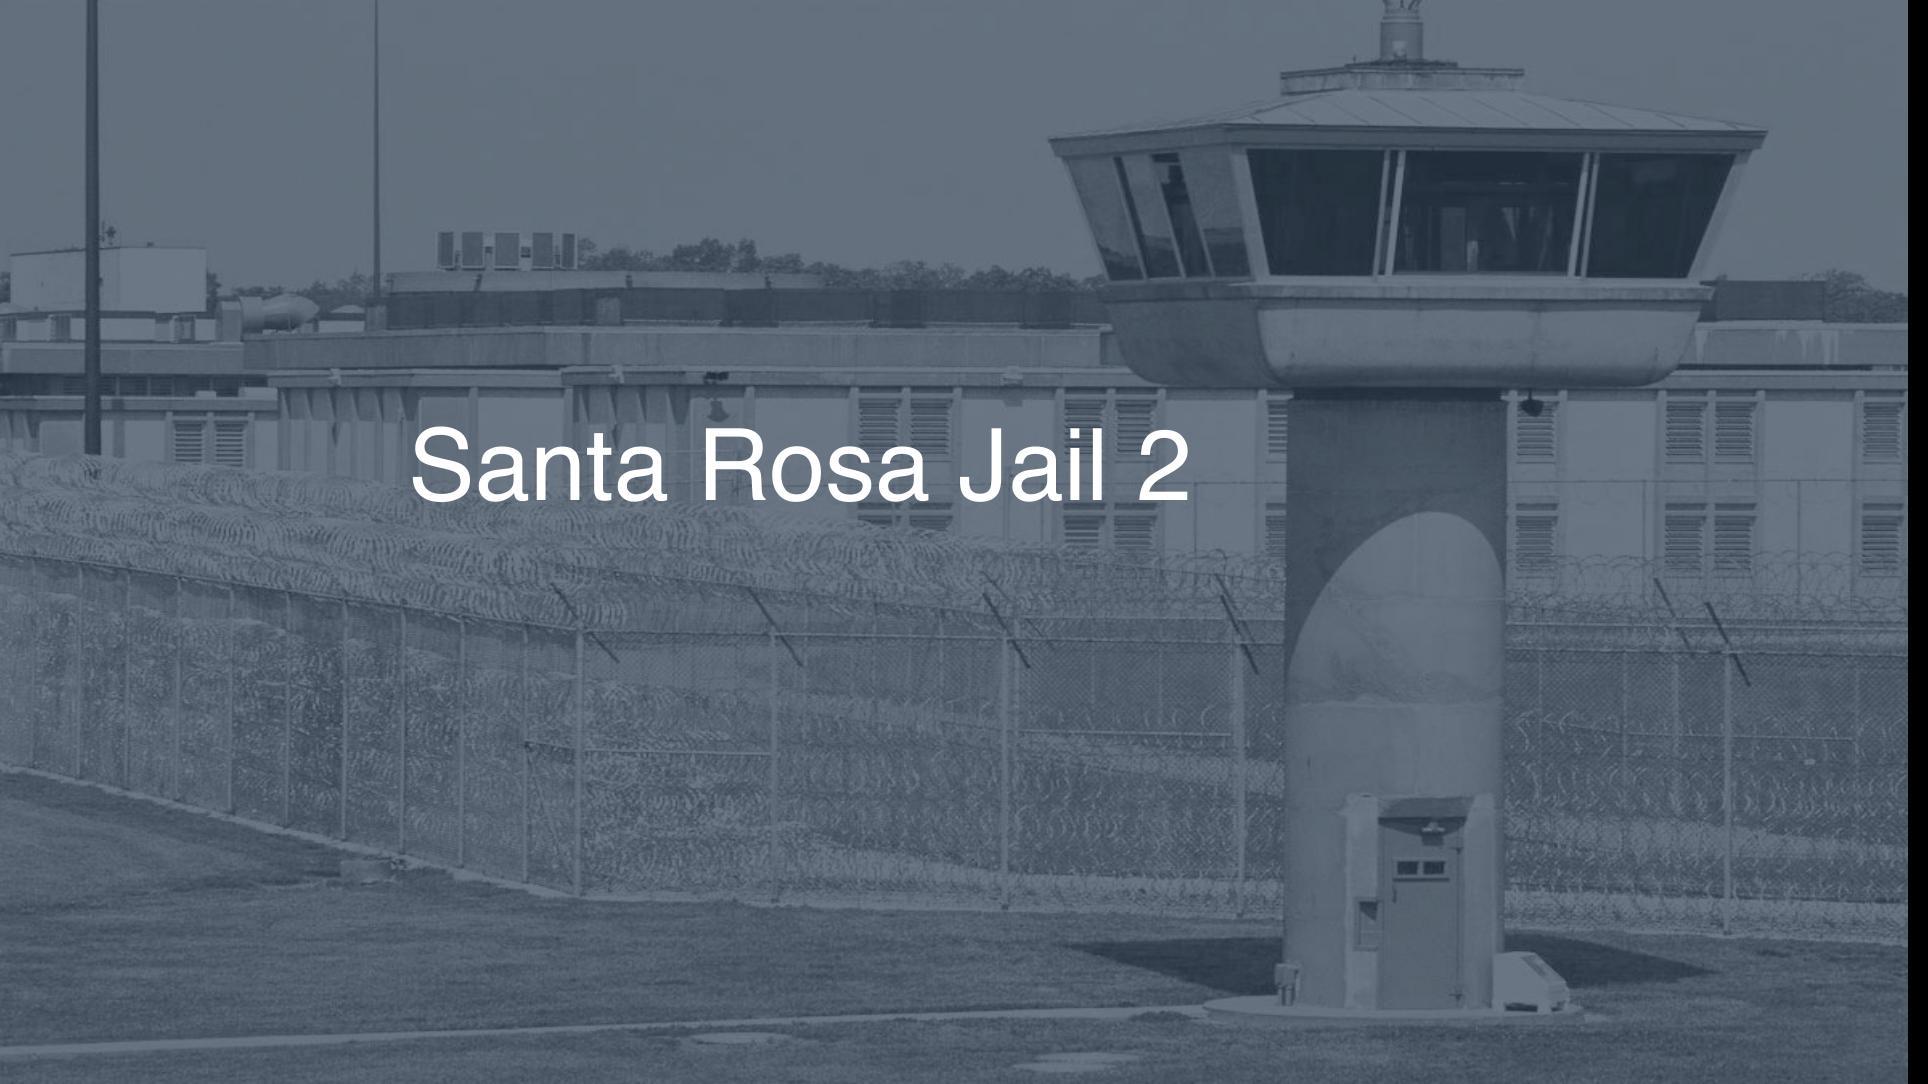 Santa Rosa Jail correctional facility picture